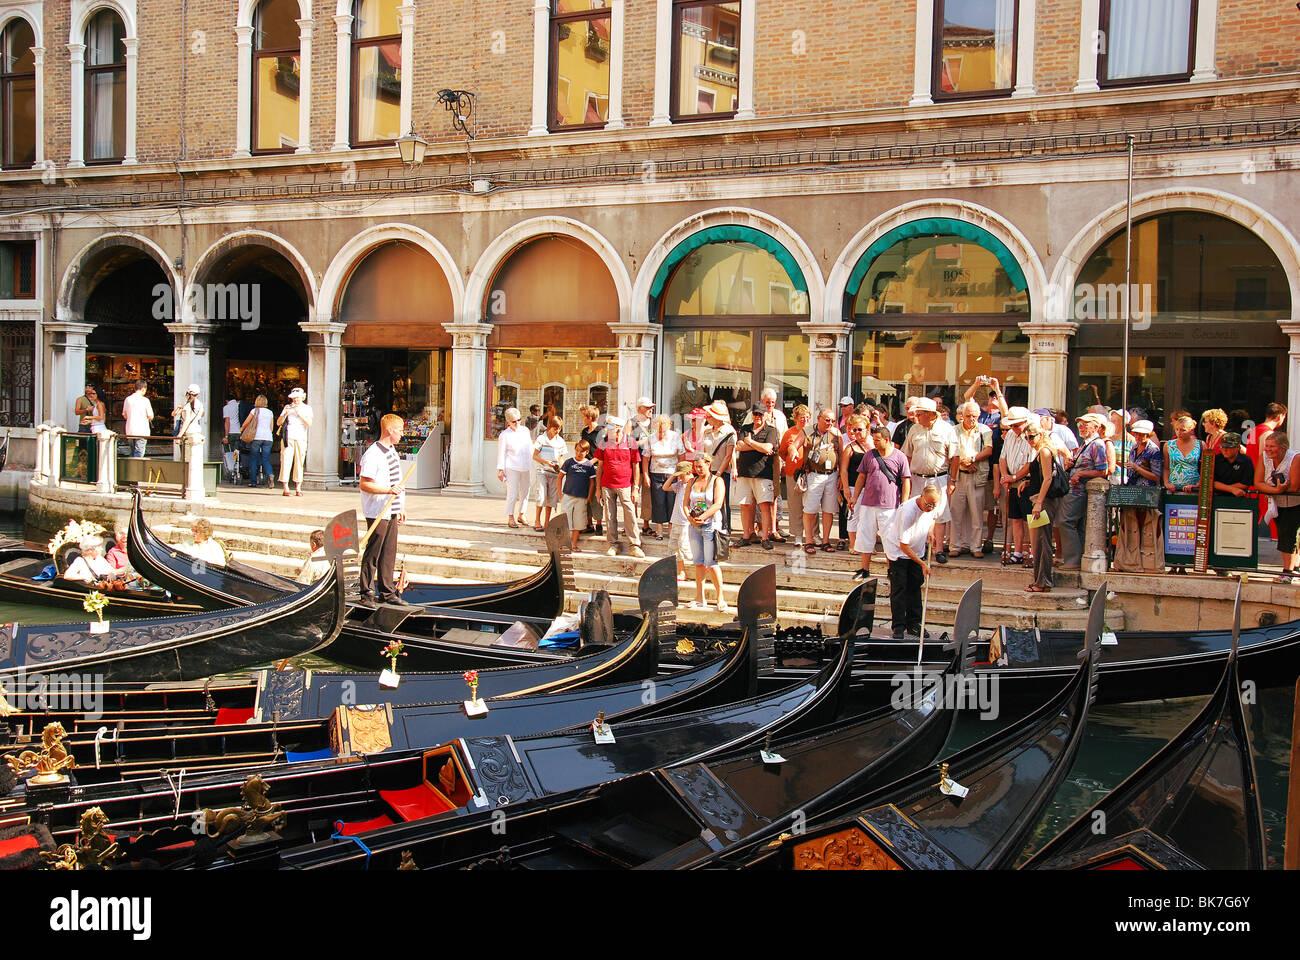 Gondolas parking in Venice. Tourists choose gondolas for traditional venetian gondola ride. Bacino Orseolo - Stock Image